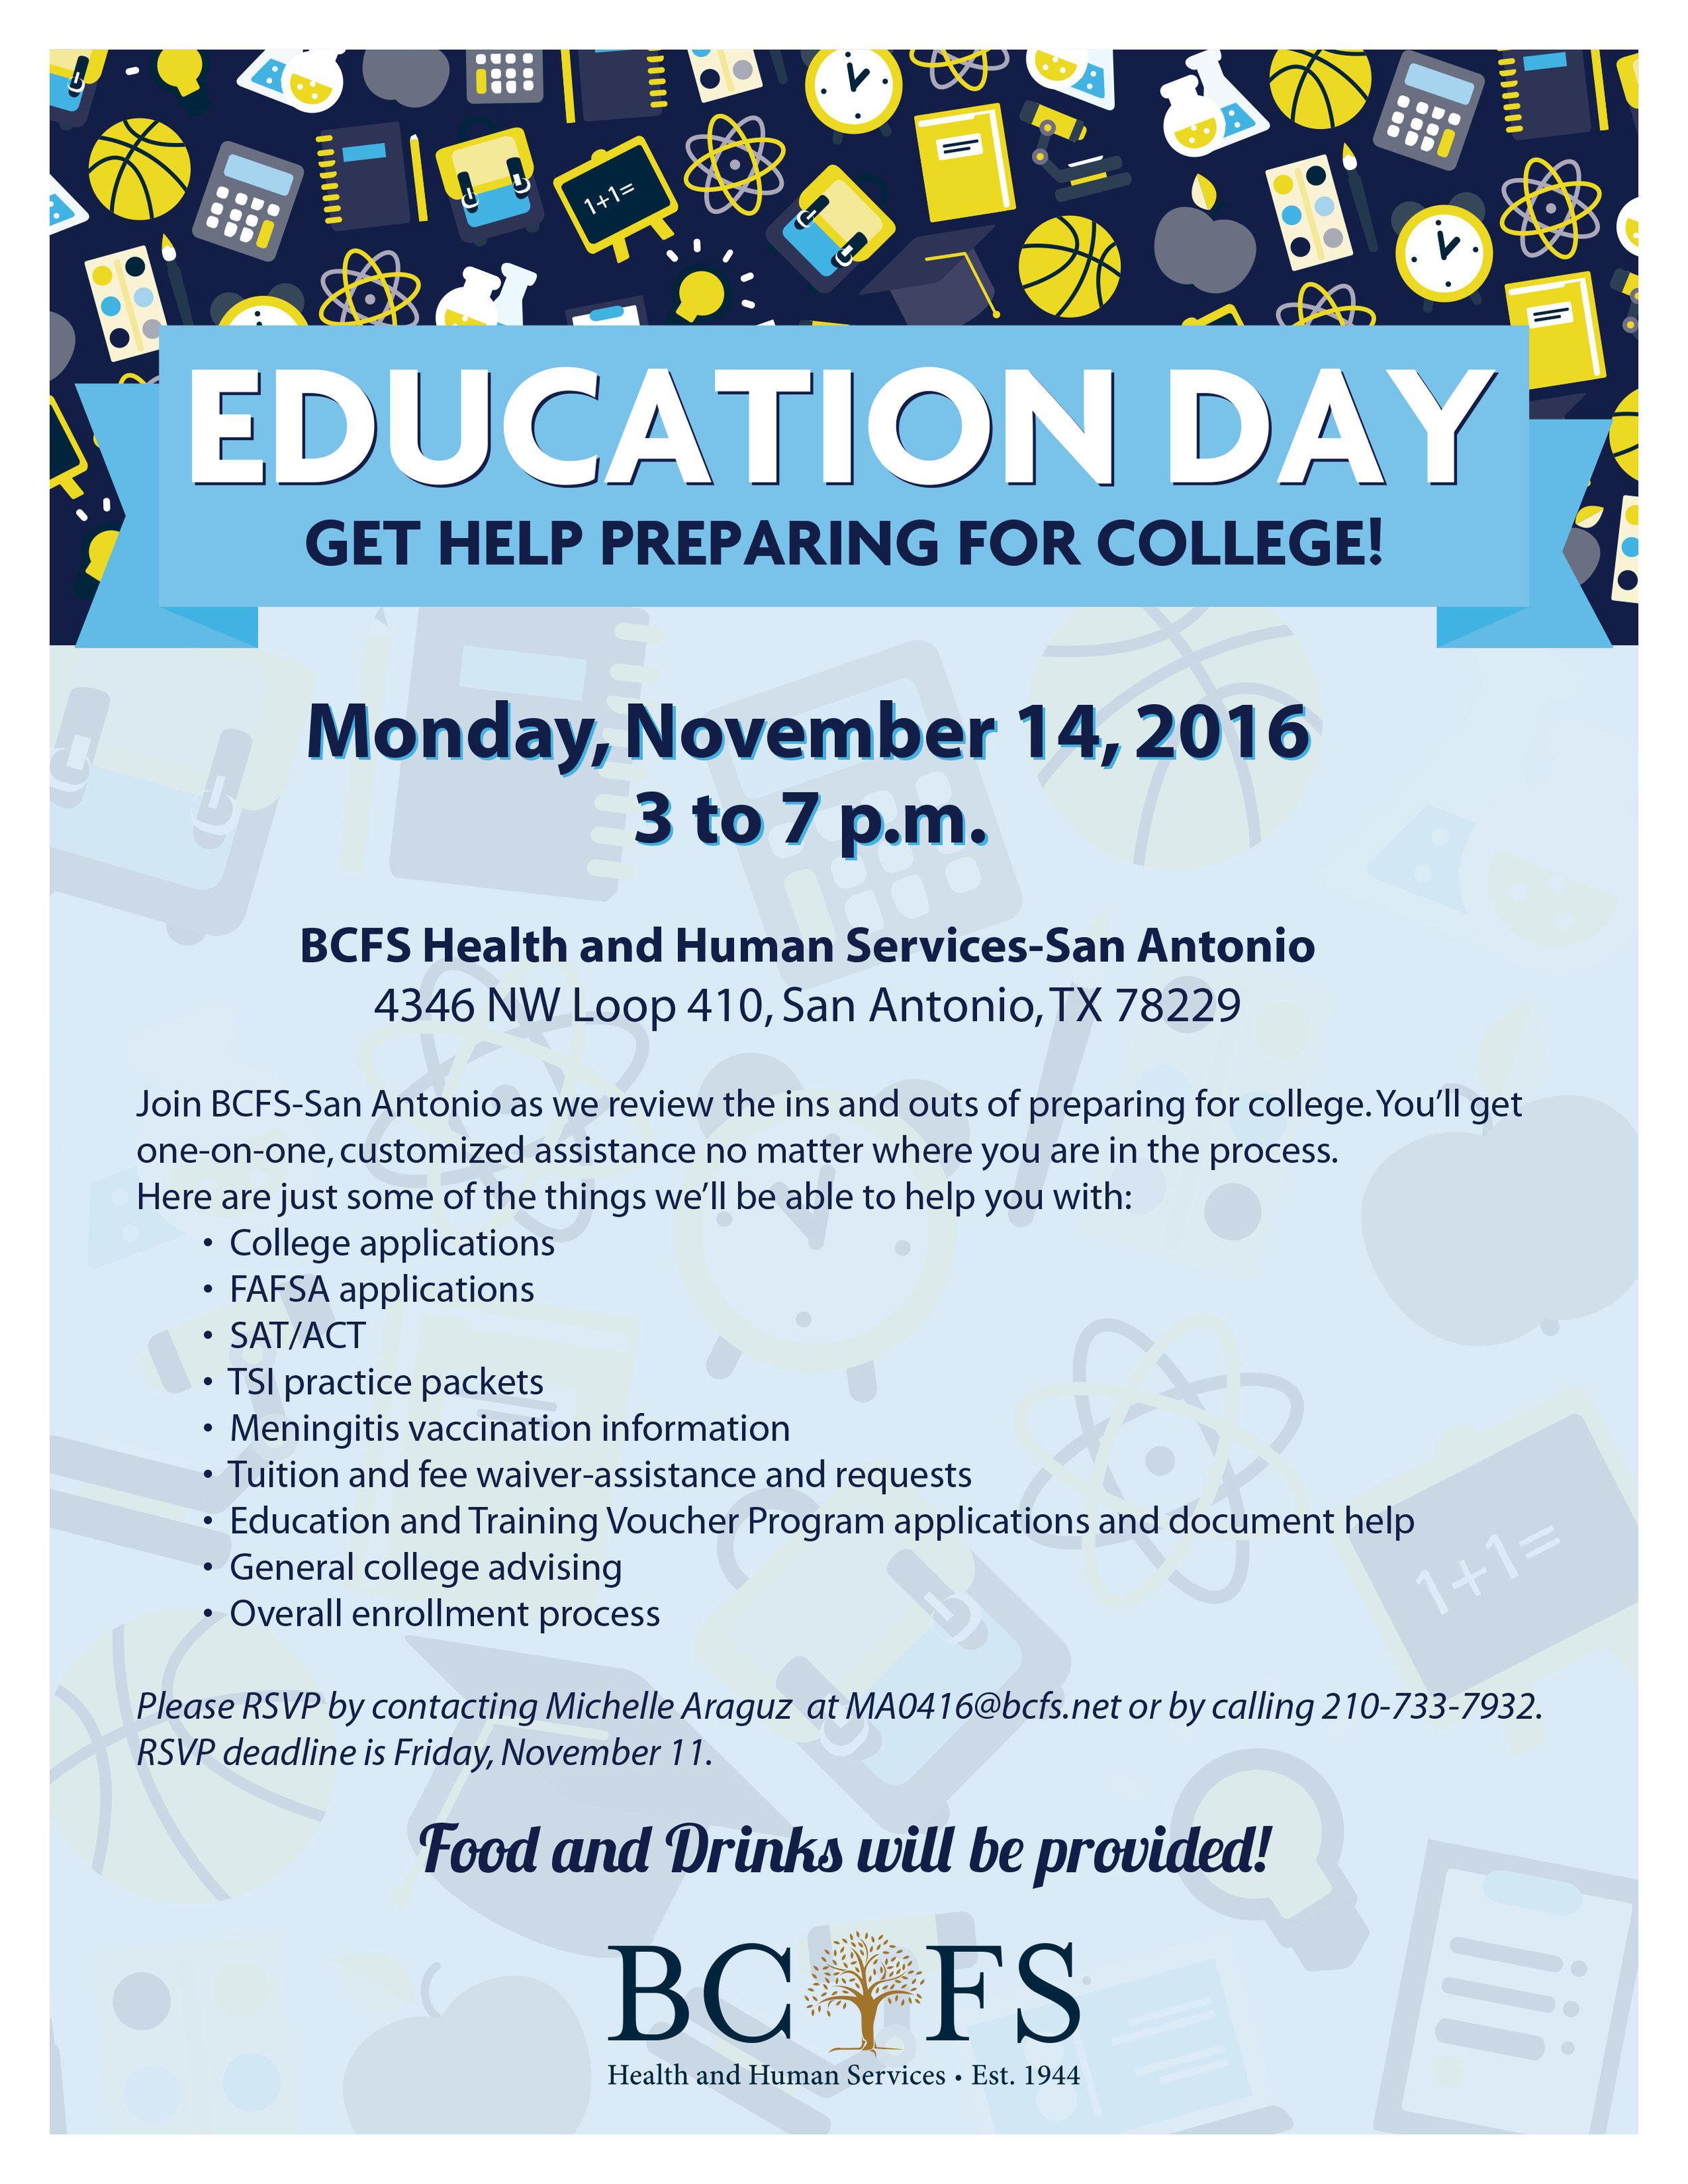 BCFSHHS-SA-EducationDay-2.jpg